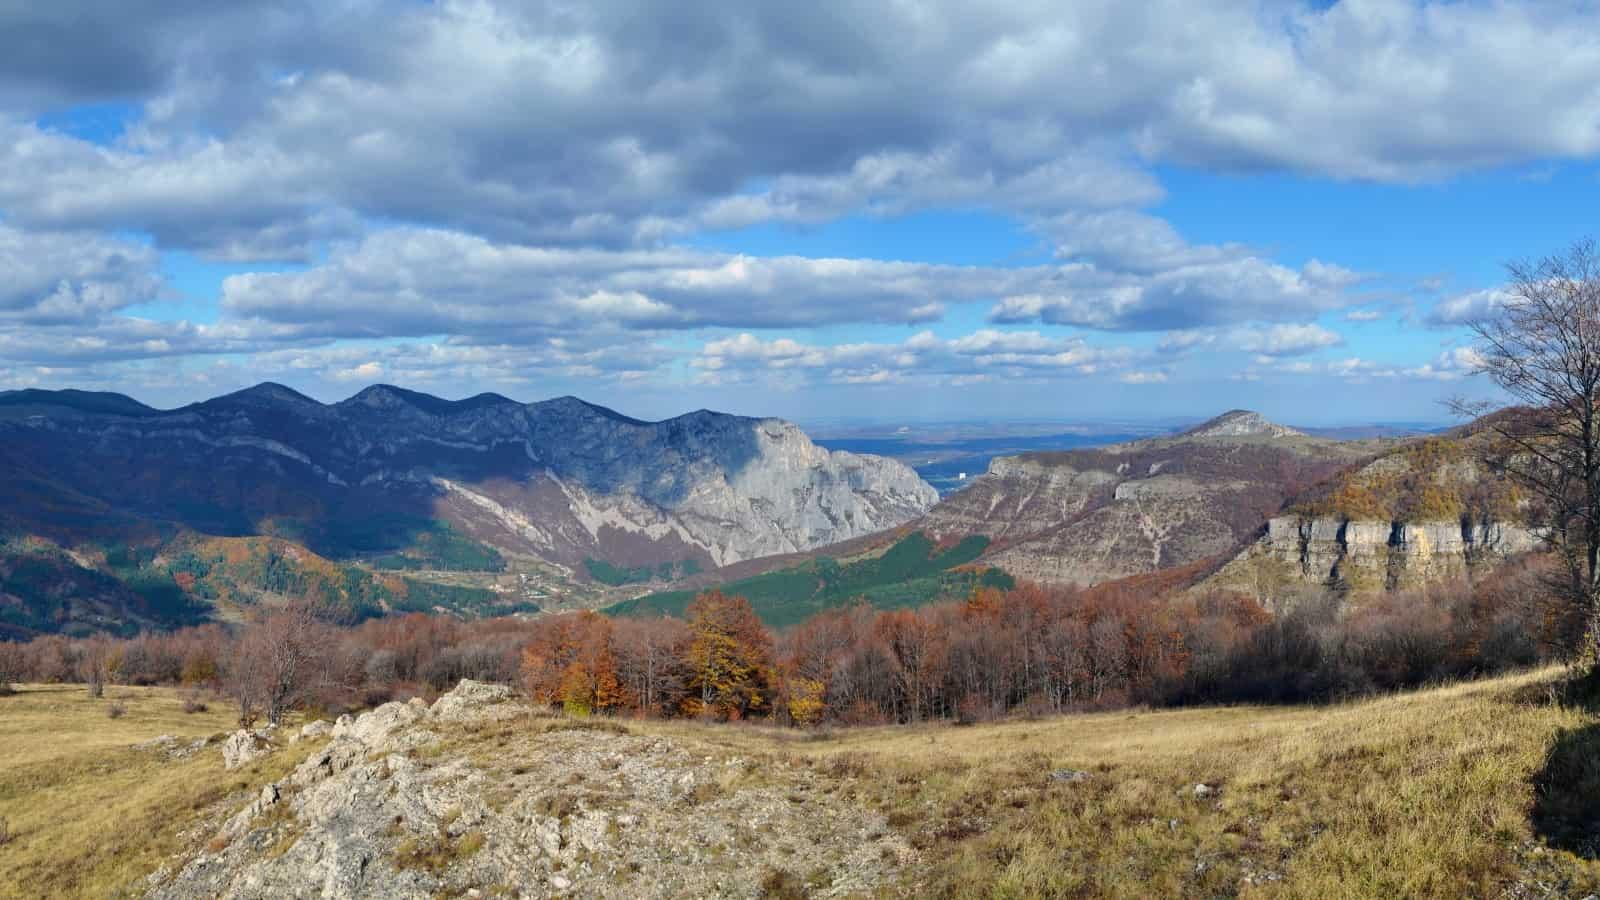 Vratsataschlucht - Panoramaaufnahme - Foto: Vrachanski Balkan Naturpark/Krasimir Lakovski